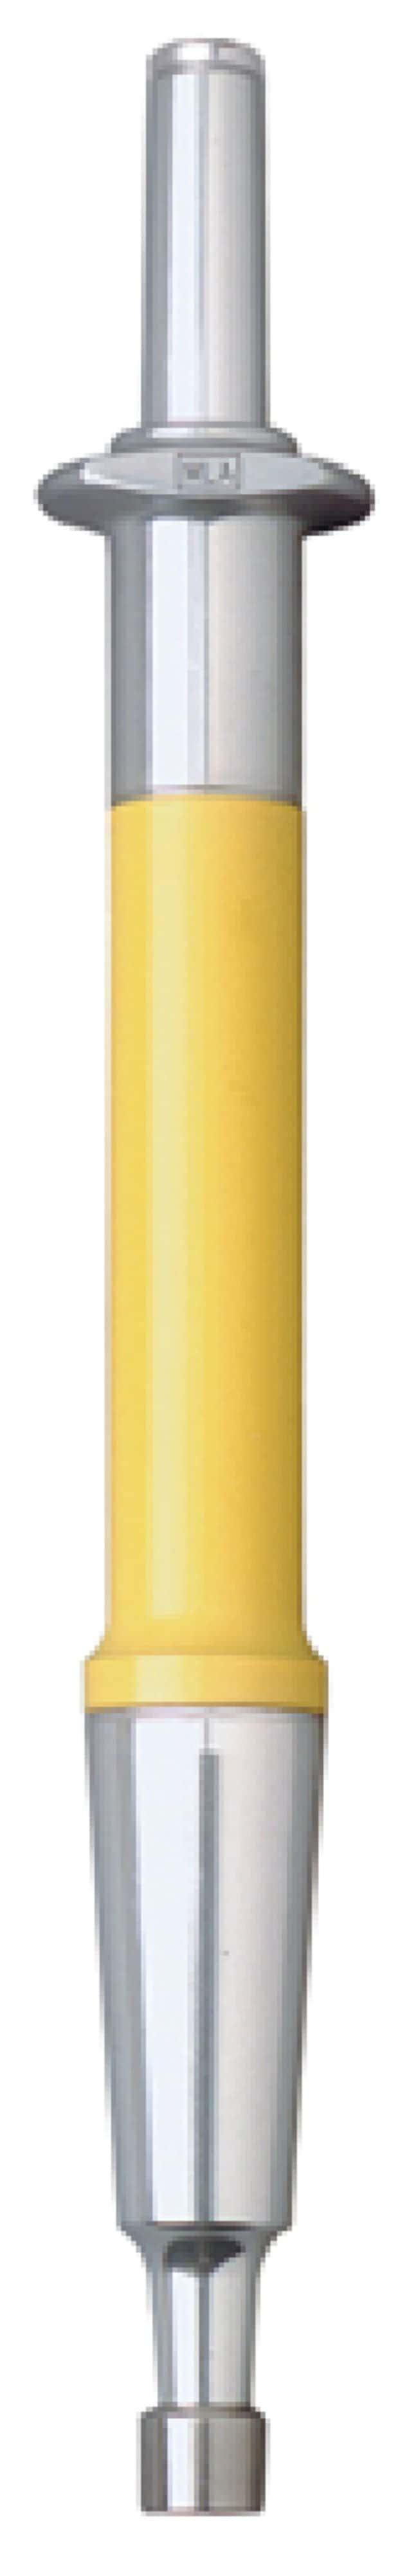 VistaLab™ TechnologiesMLA™ Brand Macro Pipetters Volume: 5mL; Barrel color: Yellow VistaLab™ TechnologiesMLA™ Brand Macro Pipetters